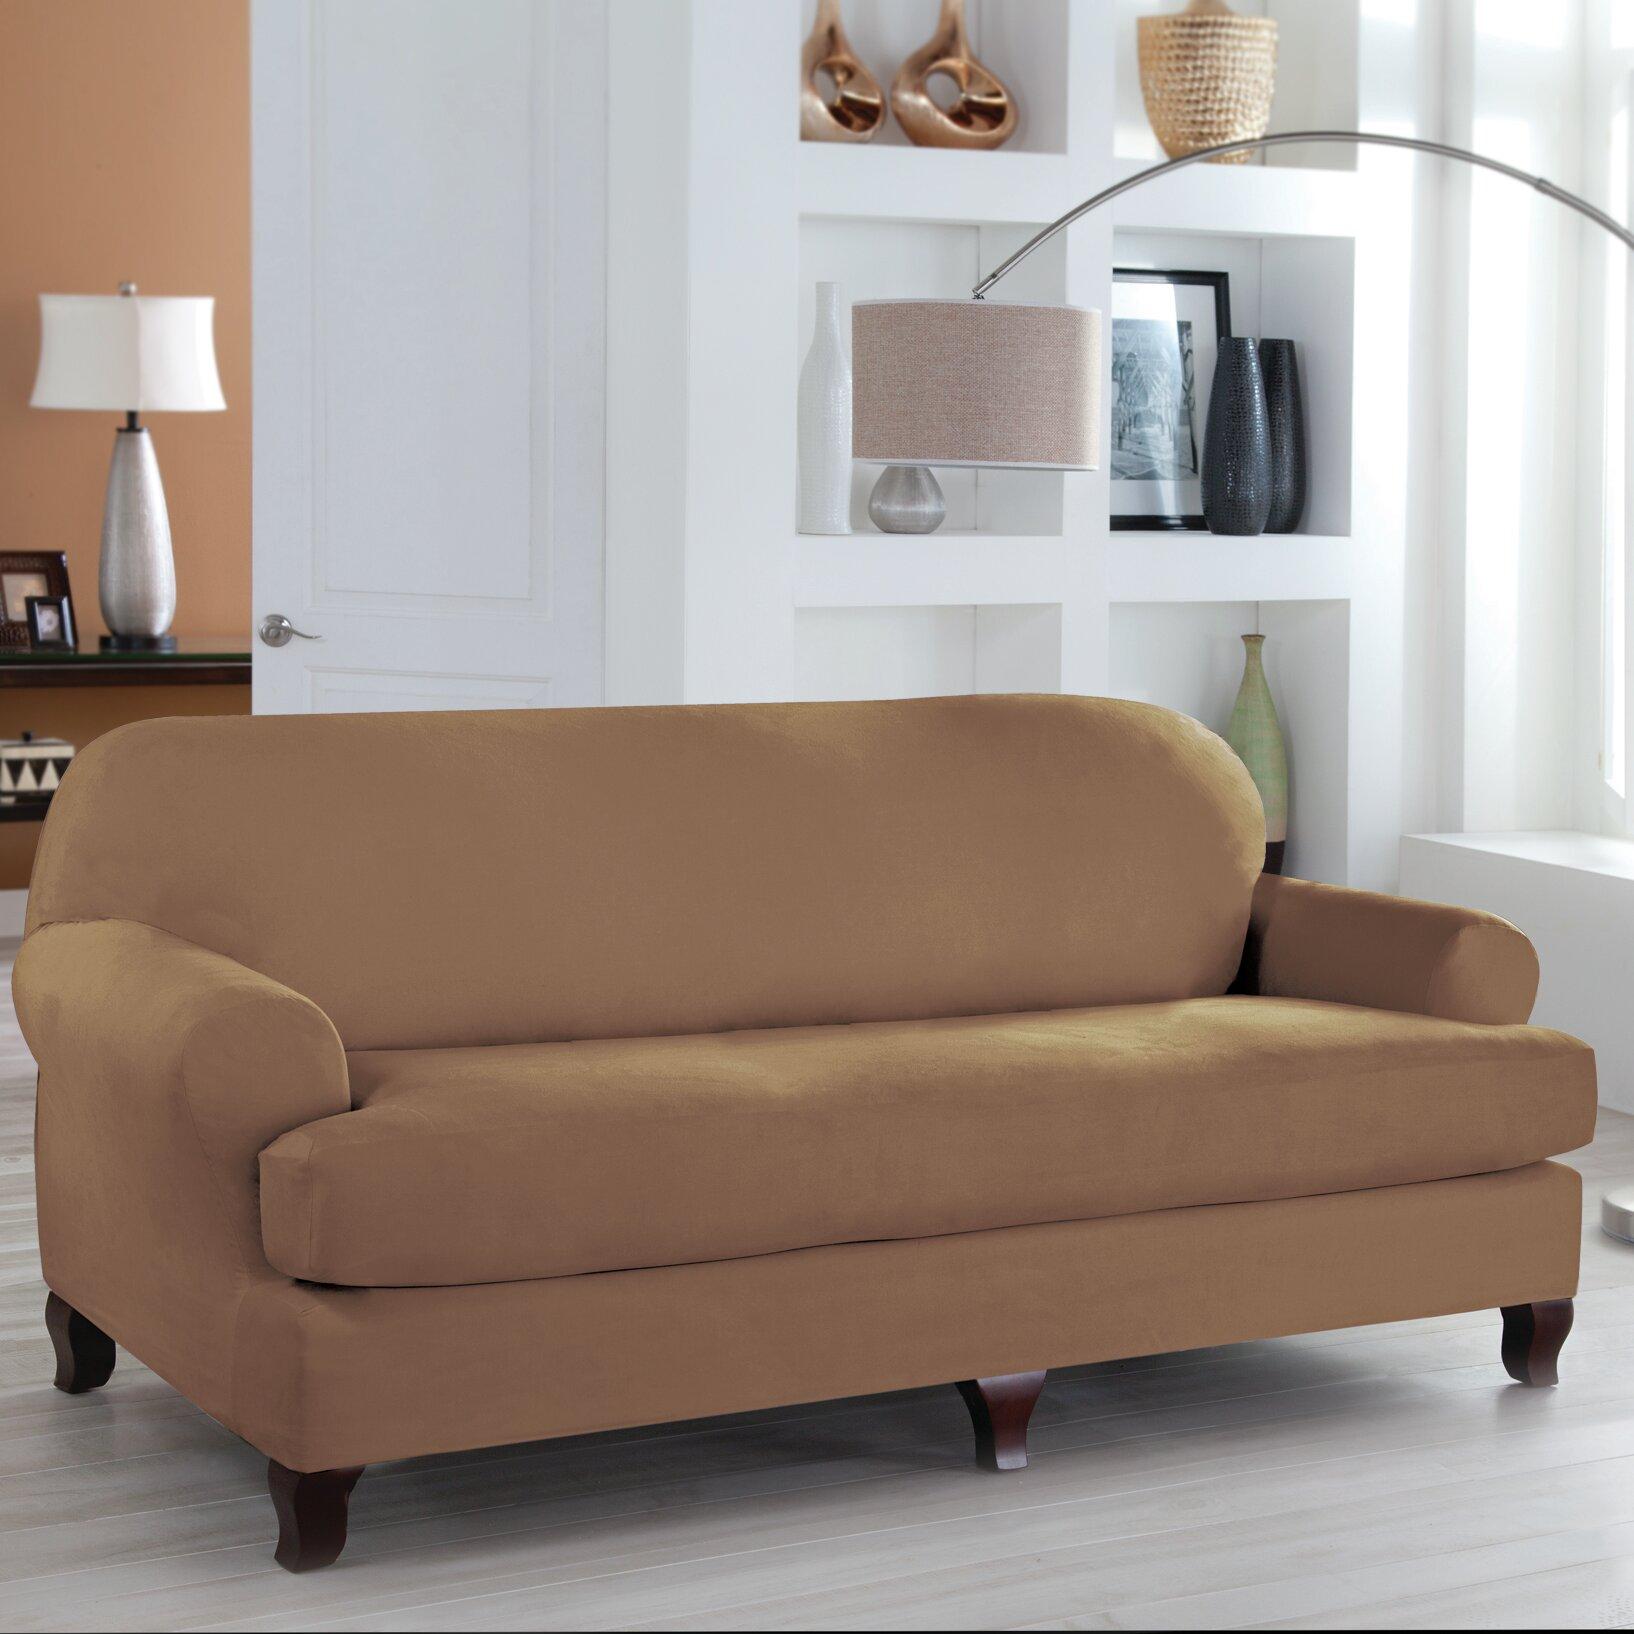 tailor fit sofa t cushion slipcover wayfair. Black Bedroom Furniture Sets. Home Design Ideas